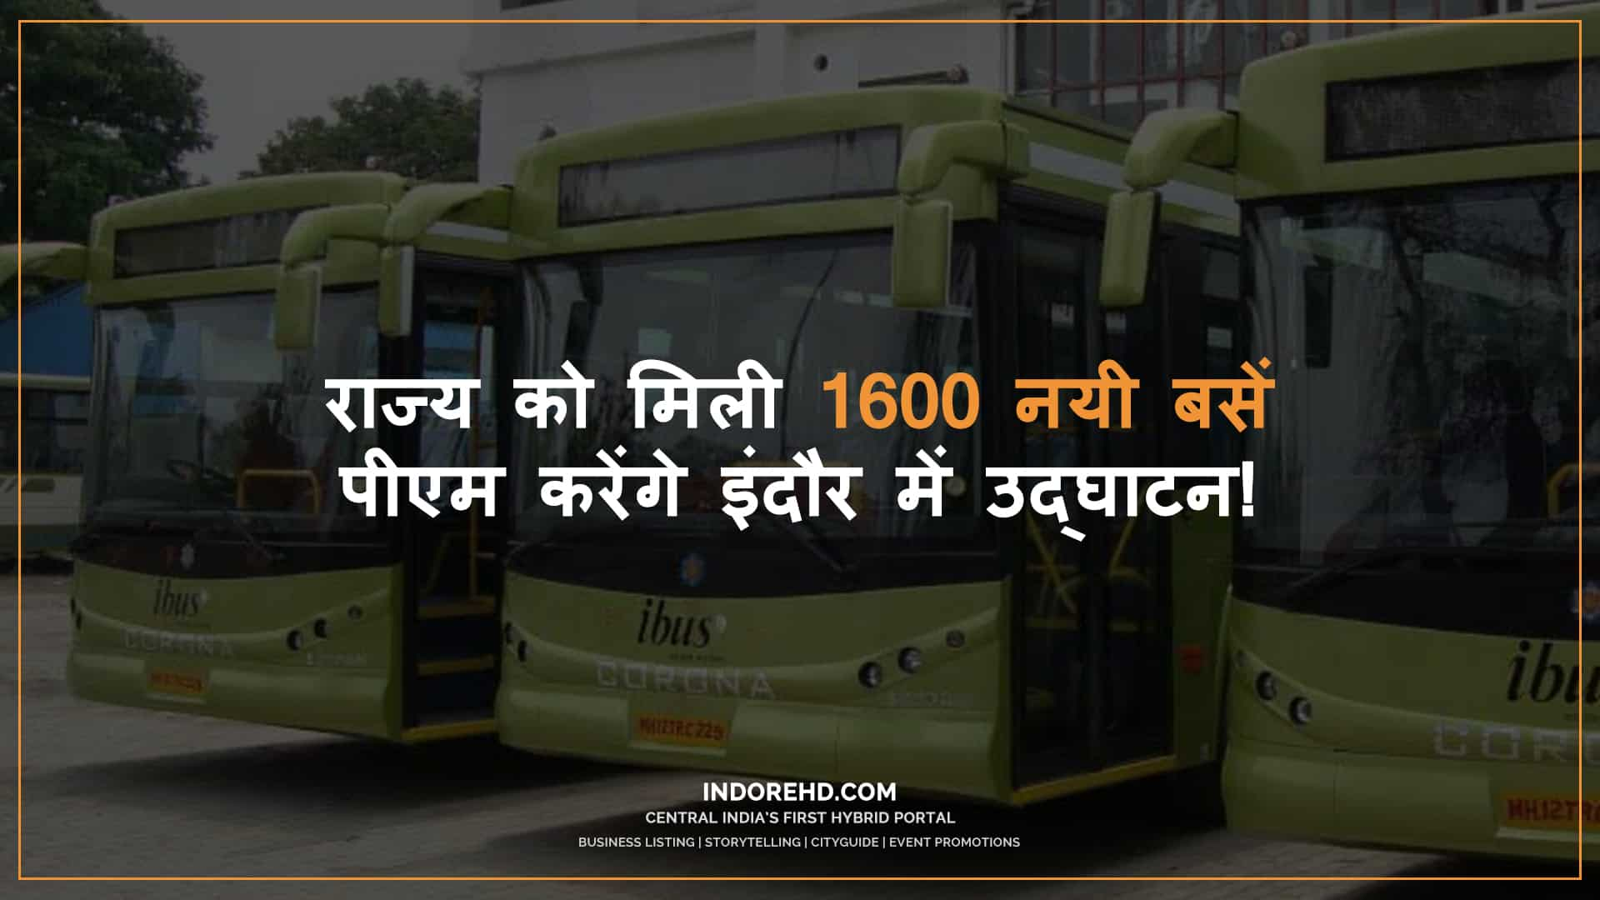 Public-Transport-buses-madhyapradesh-indorehd